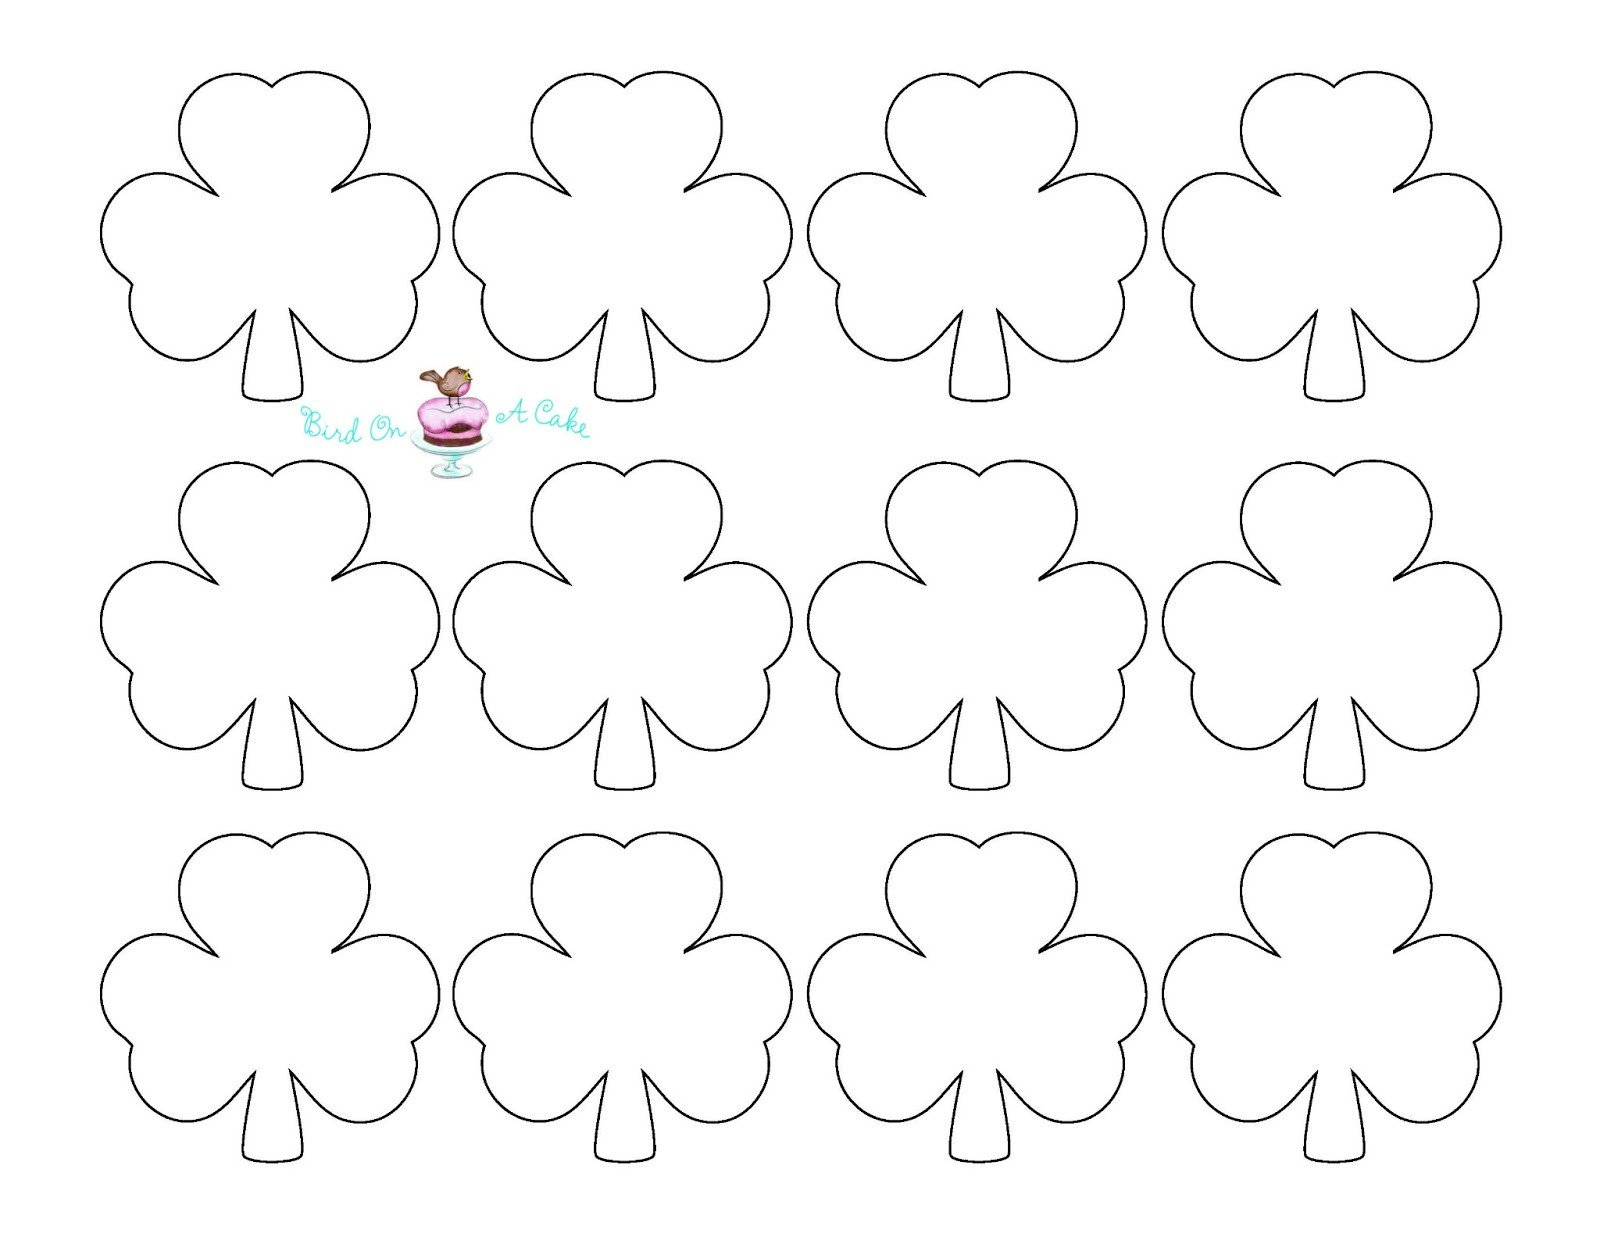 Shamrock Template Free Printable Bird A Cake St Patrick S Day Shamrock Cupcake toppers